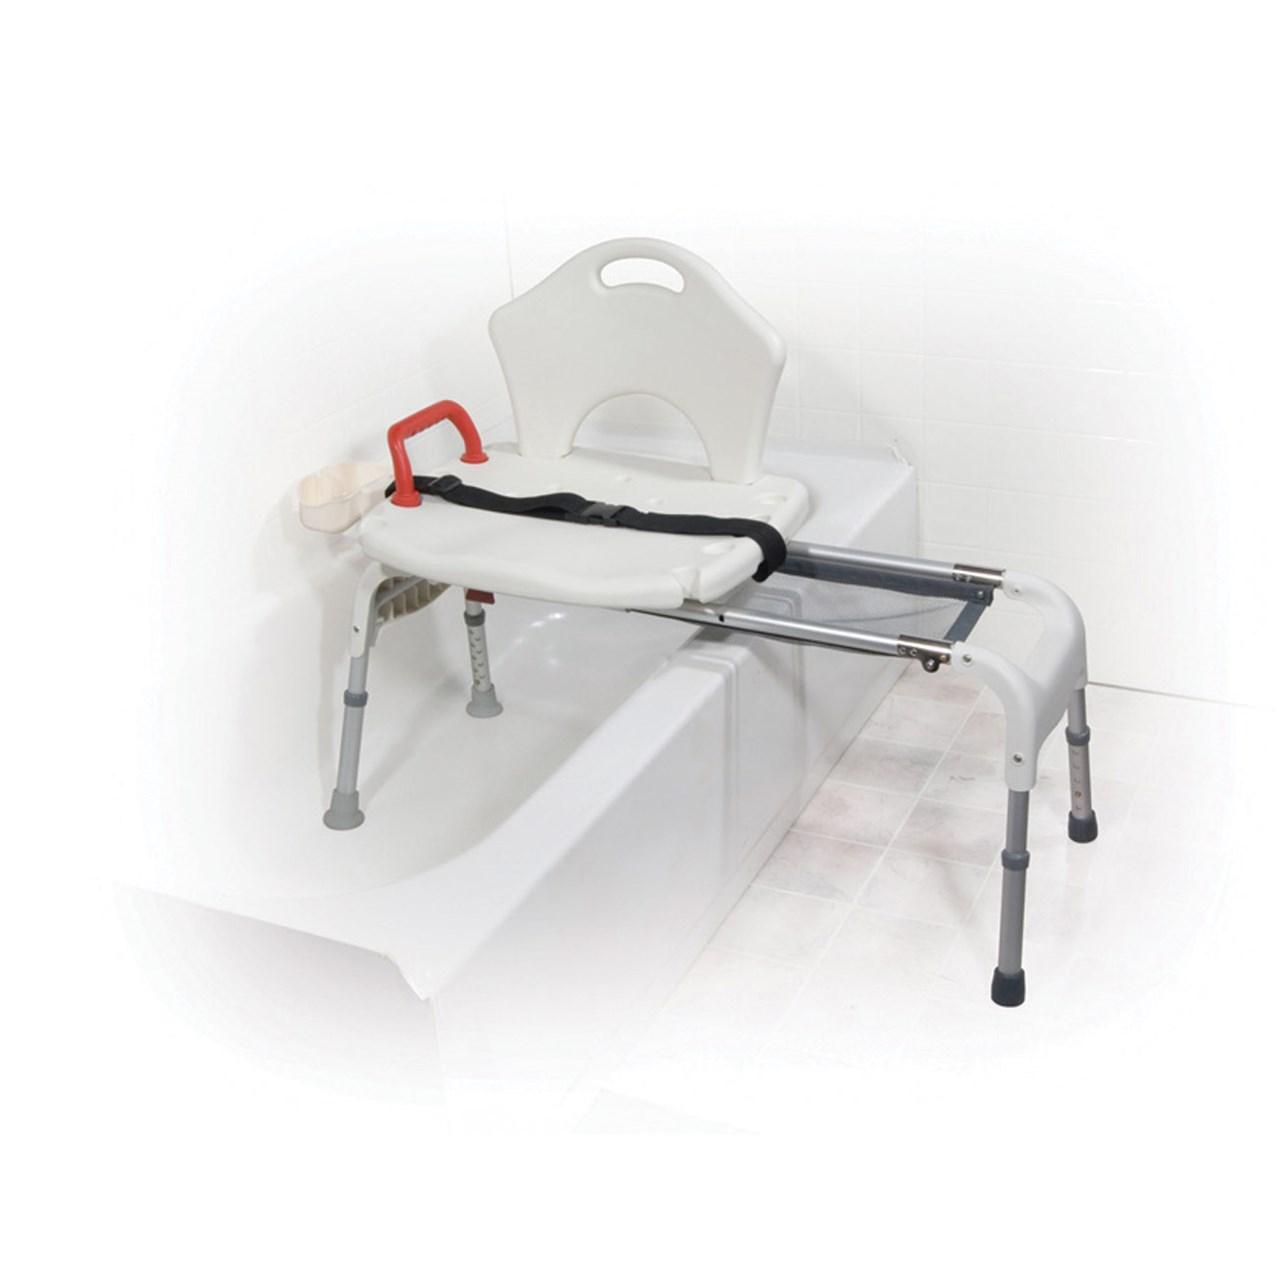 Maxiaids Drive Folding Universal Sliding Transfer Bench